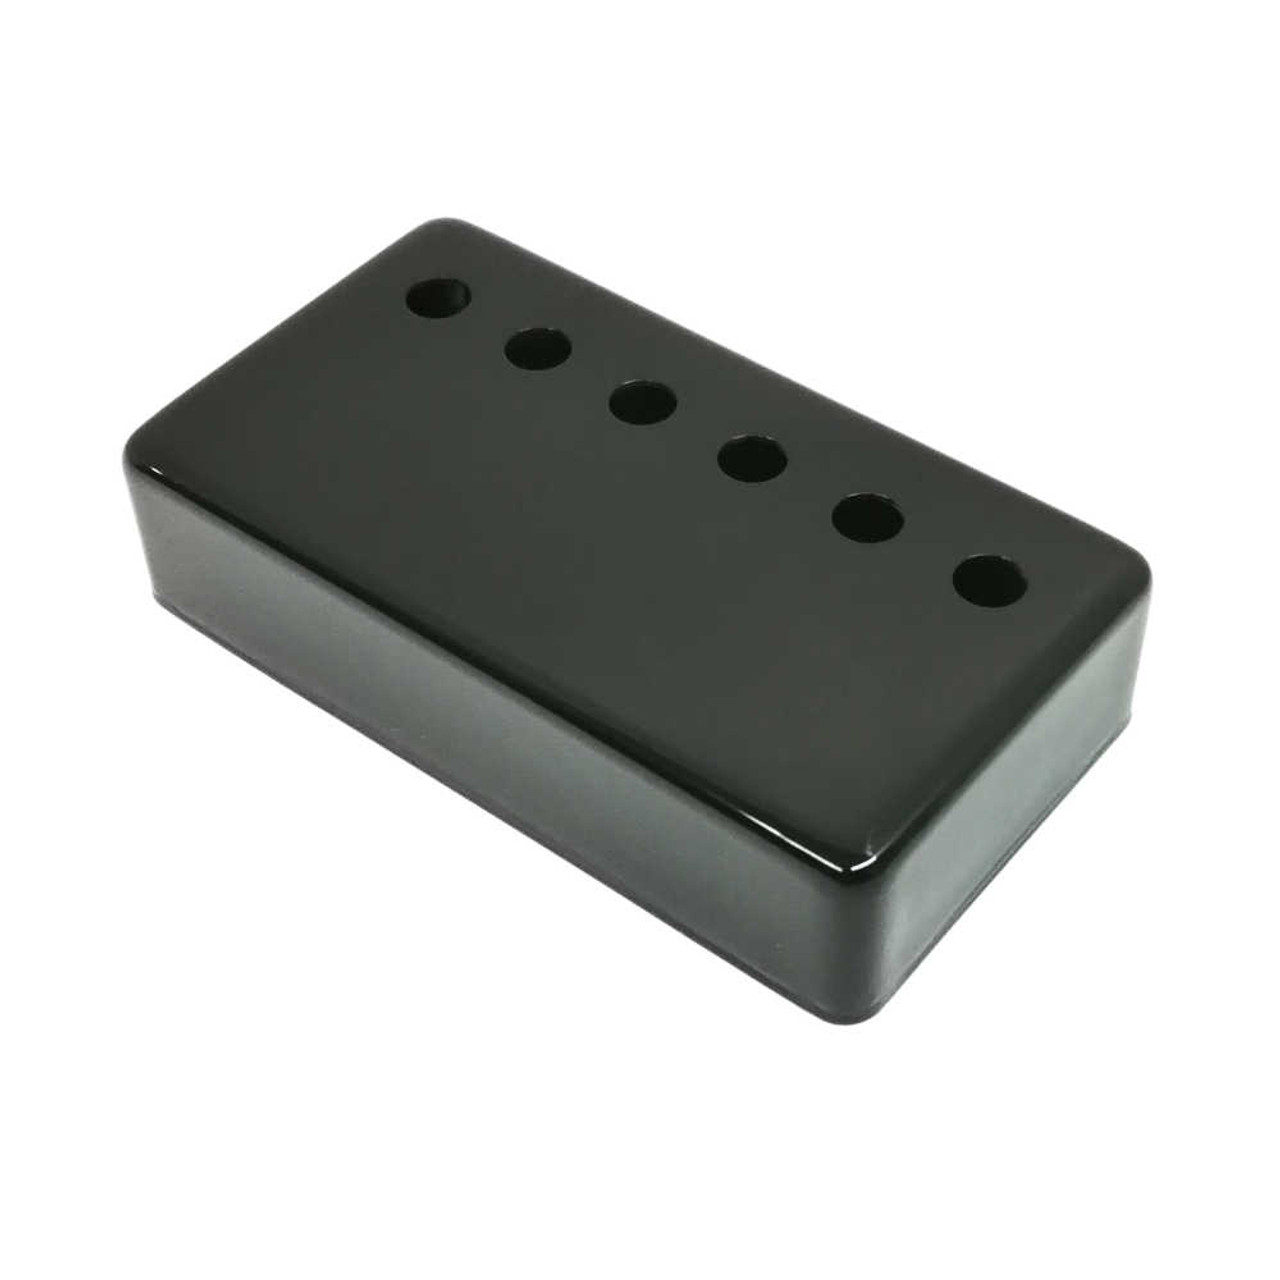 Humbucking Pickup Cover - 50mm Black (plated nickel/silver)